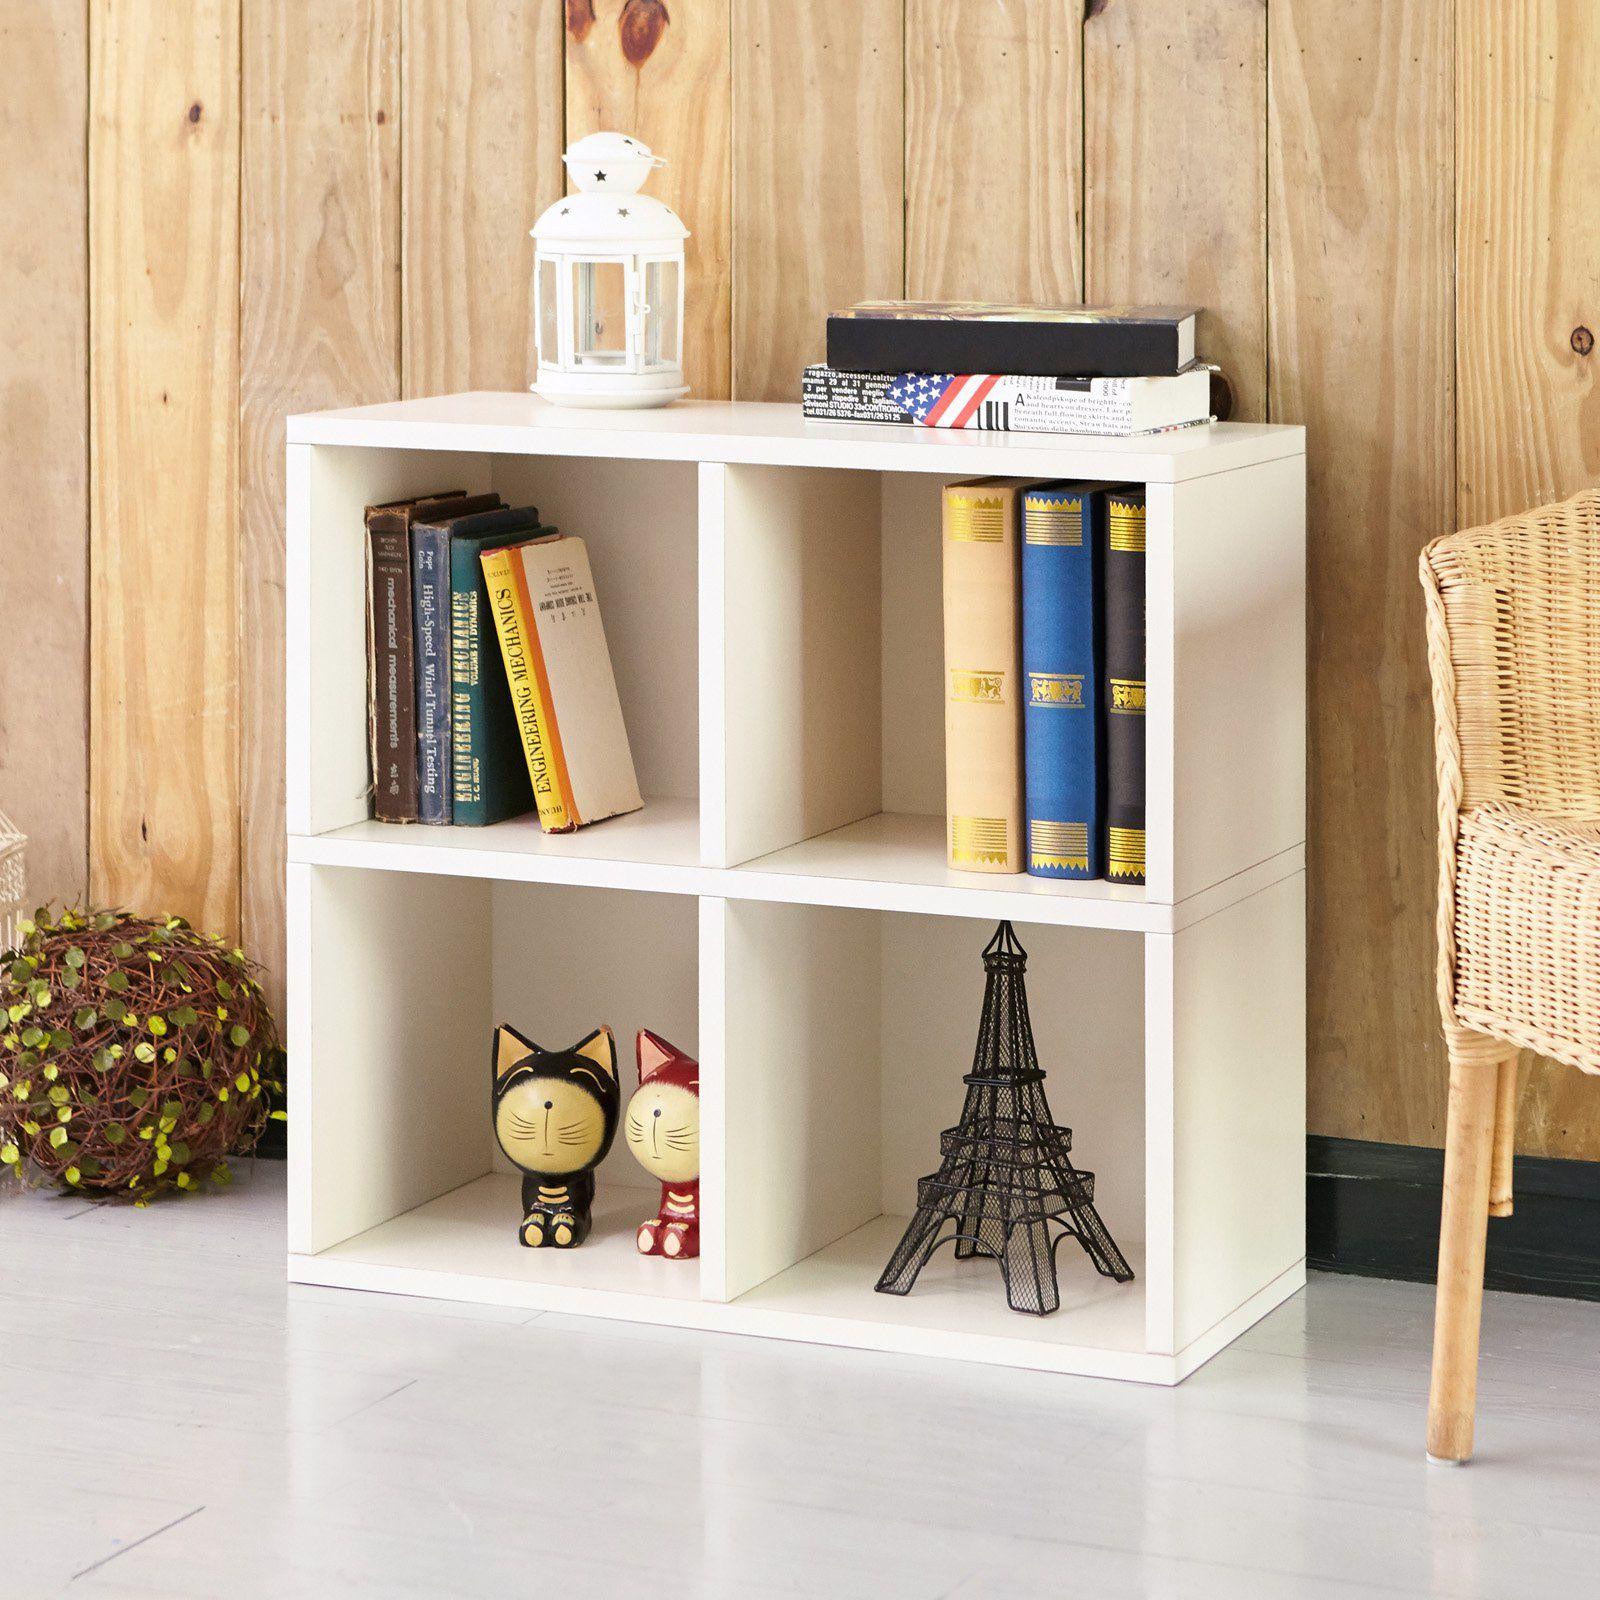 Way Basics Eco Friendly 4 Cubby Bookcase Bookcase Storage Cubbies Storage Shelves